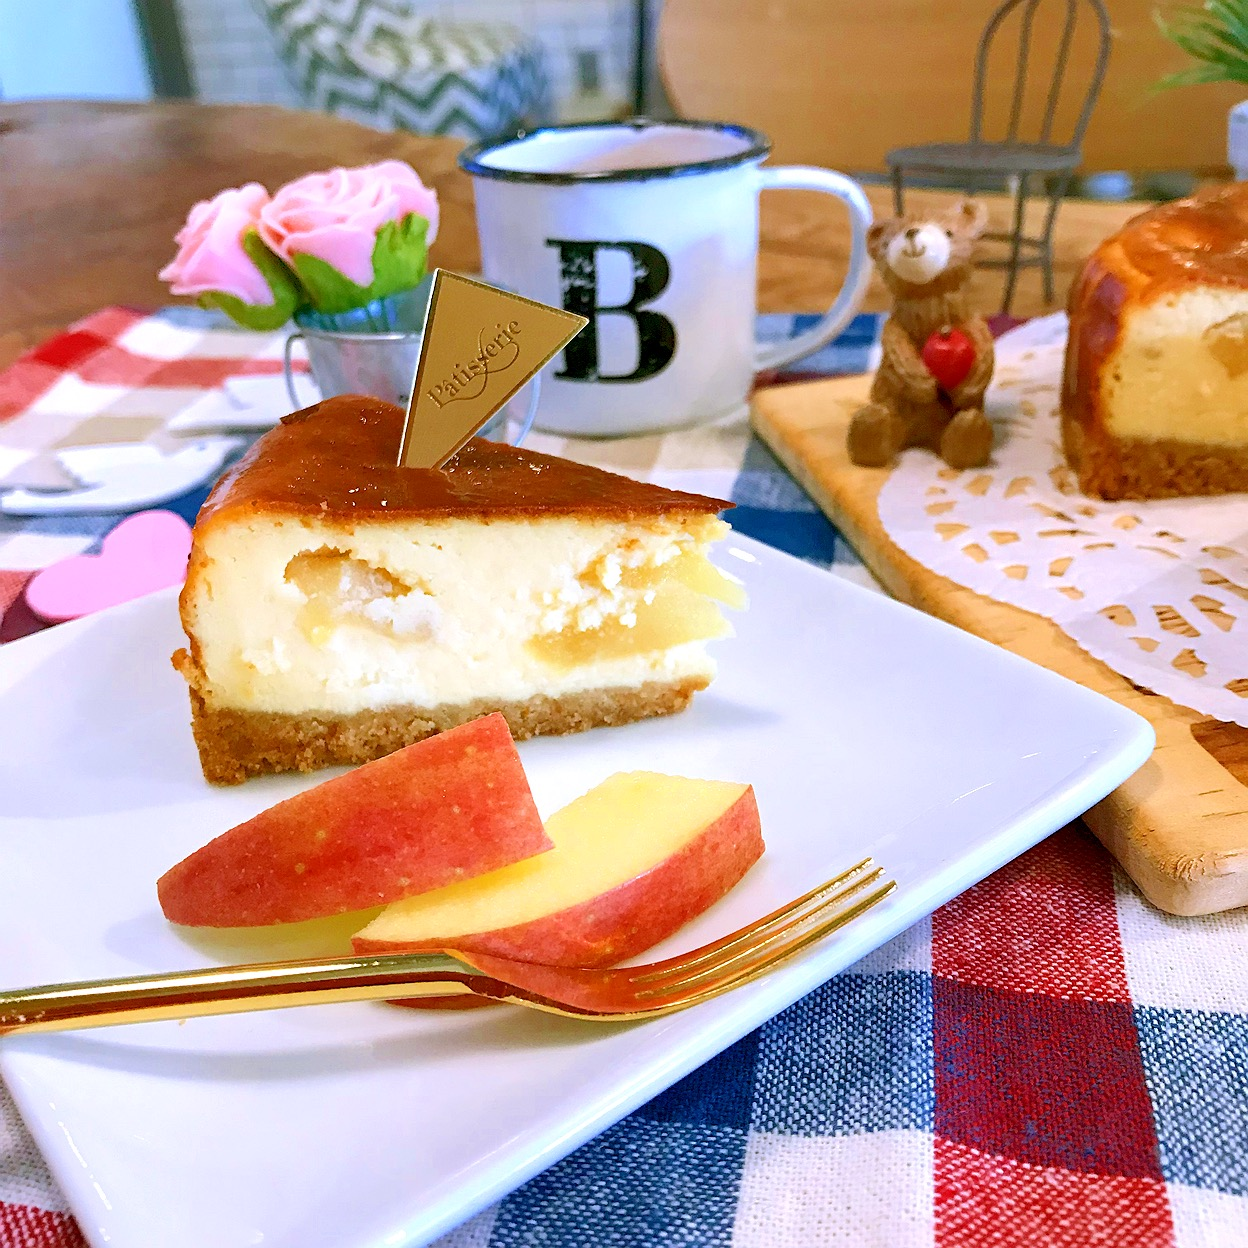 apple baked cheesecake